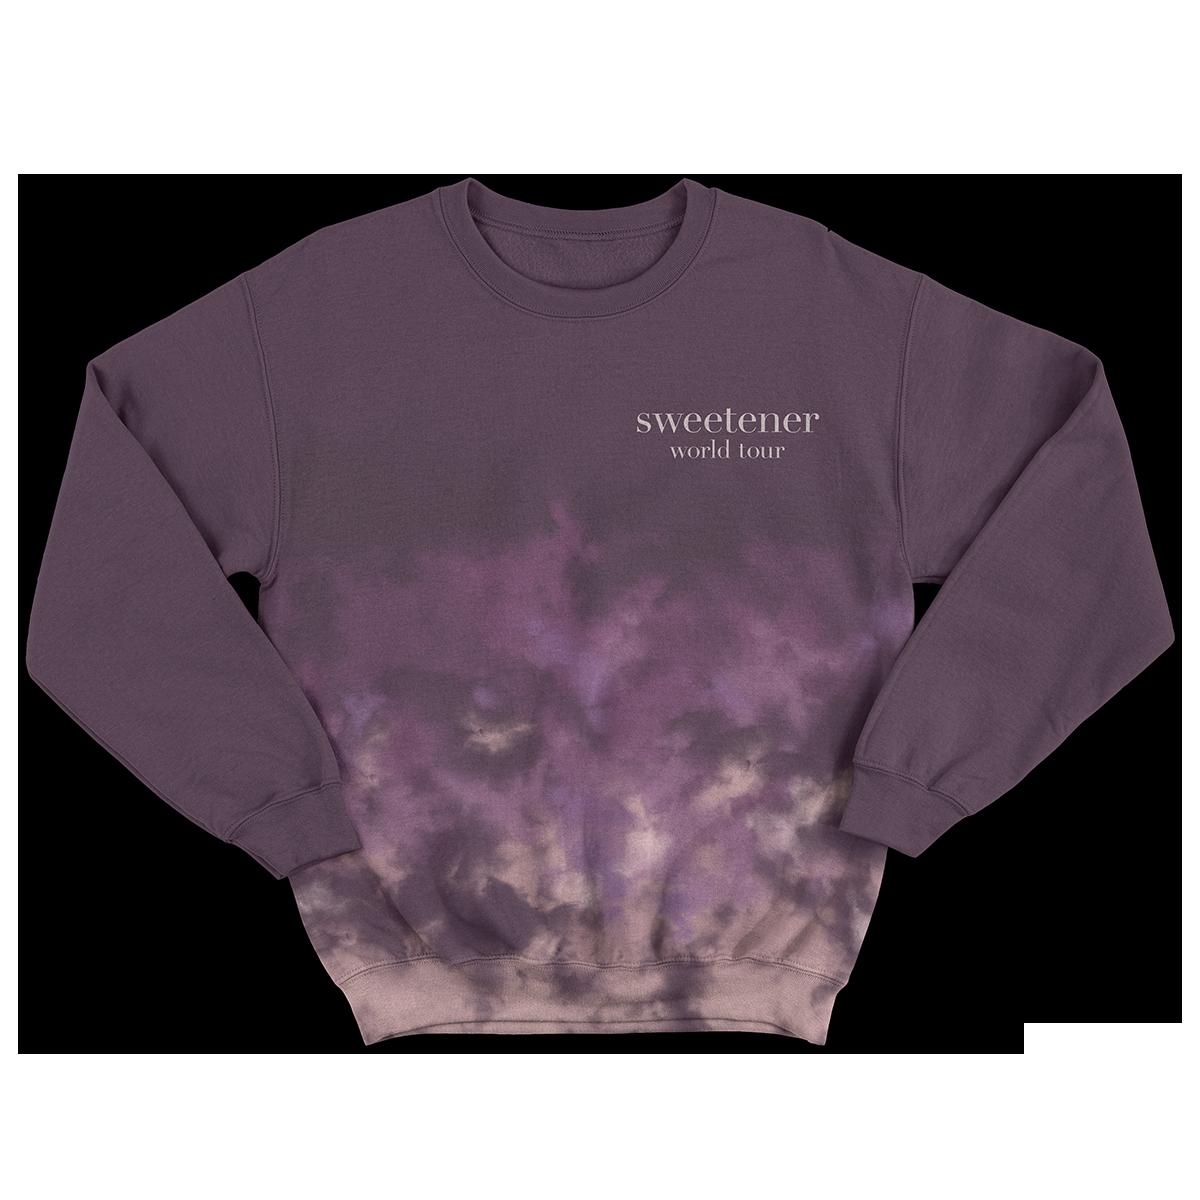 sweatshirt2.1.png